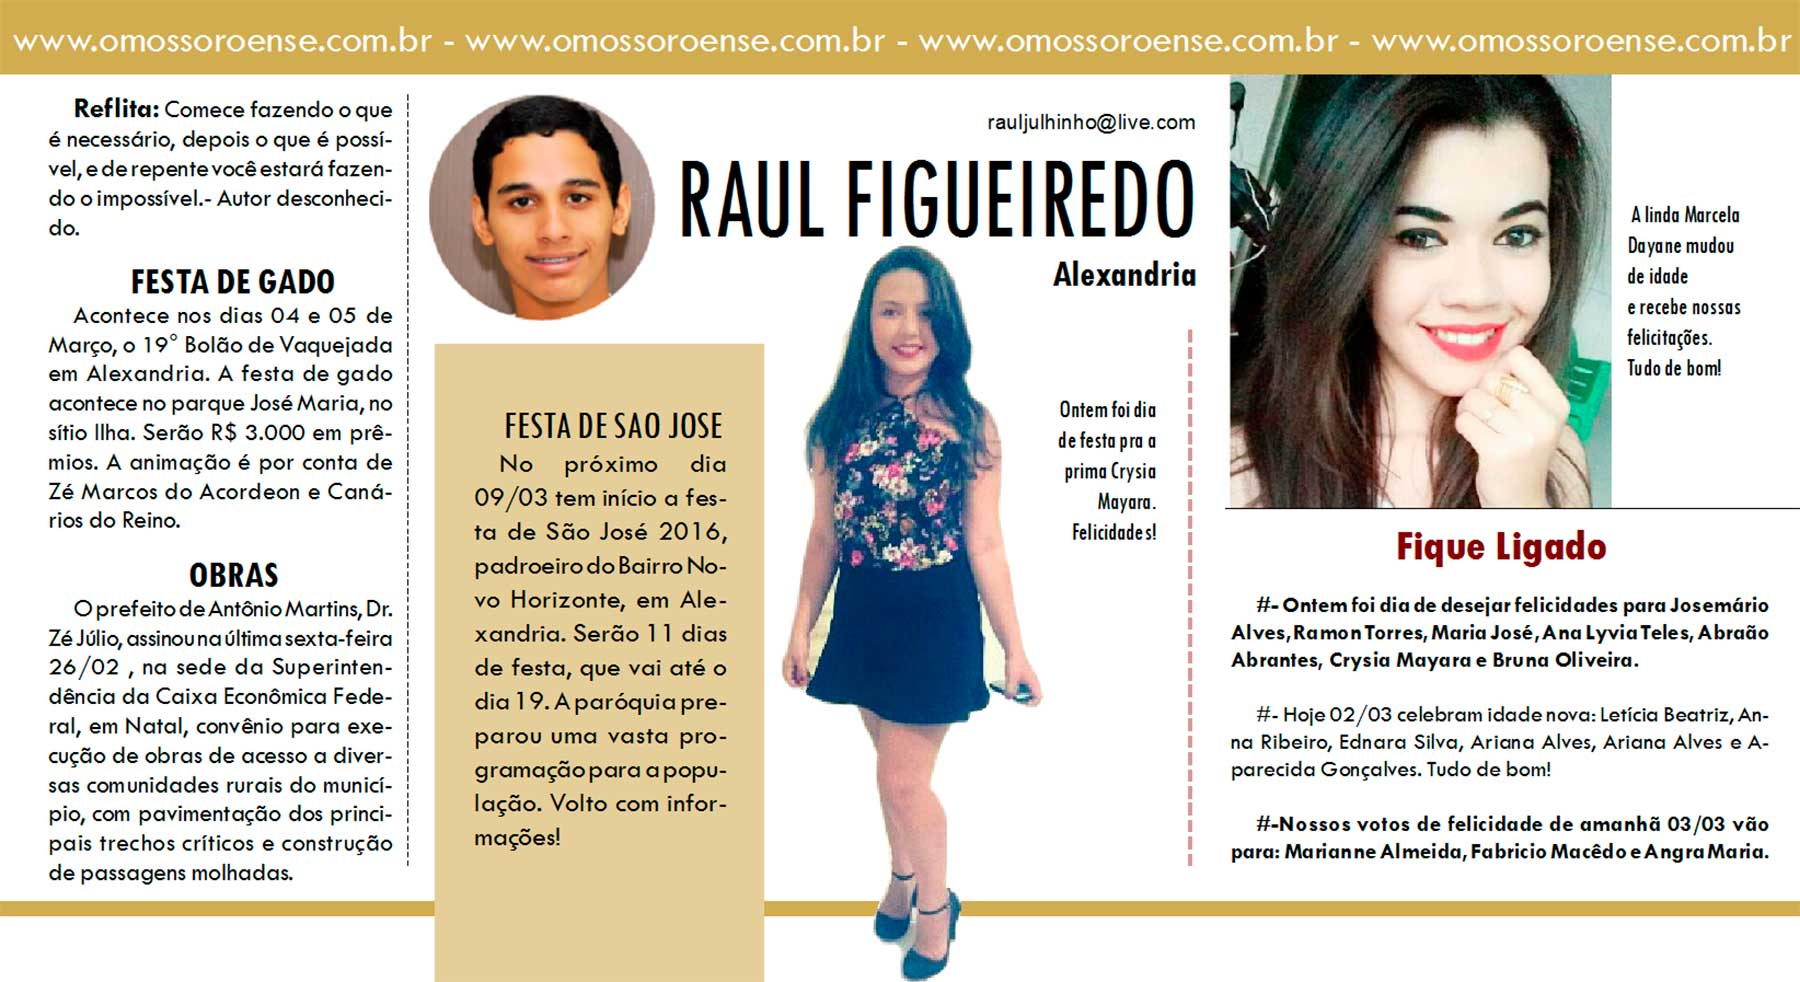 RAUL-FIGUEIREDO---ALEXANDRIA---01-03-2016